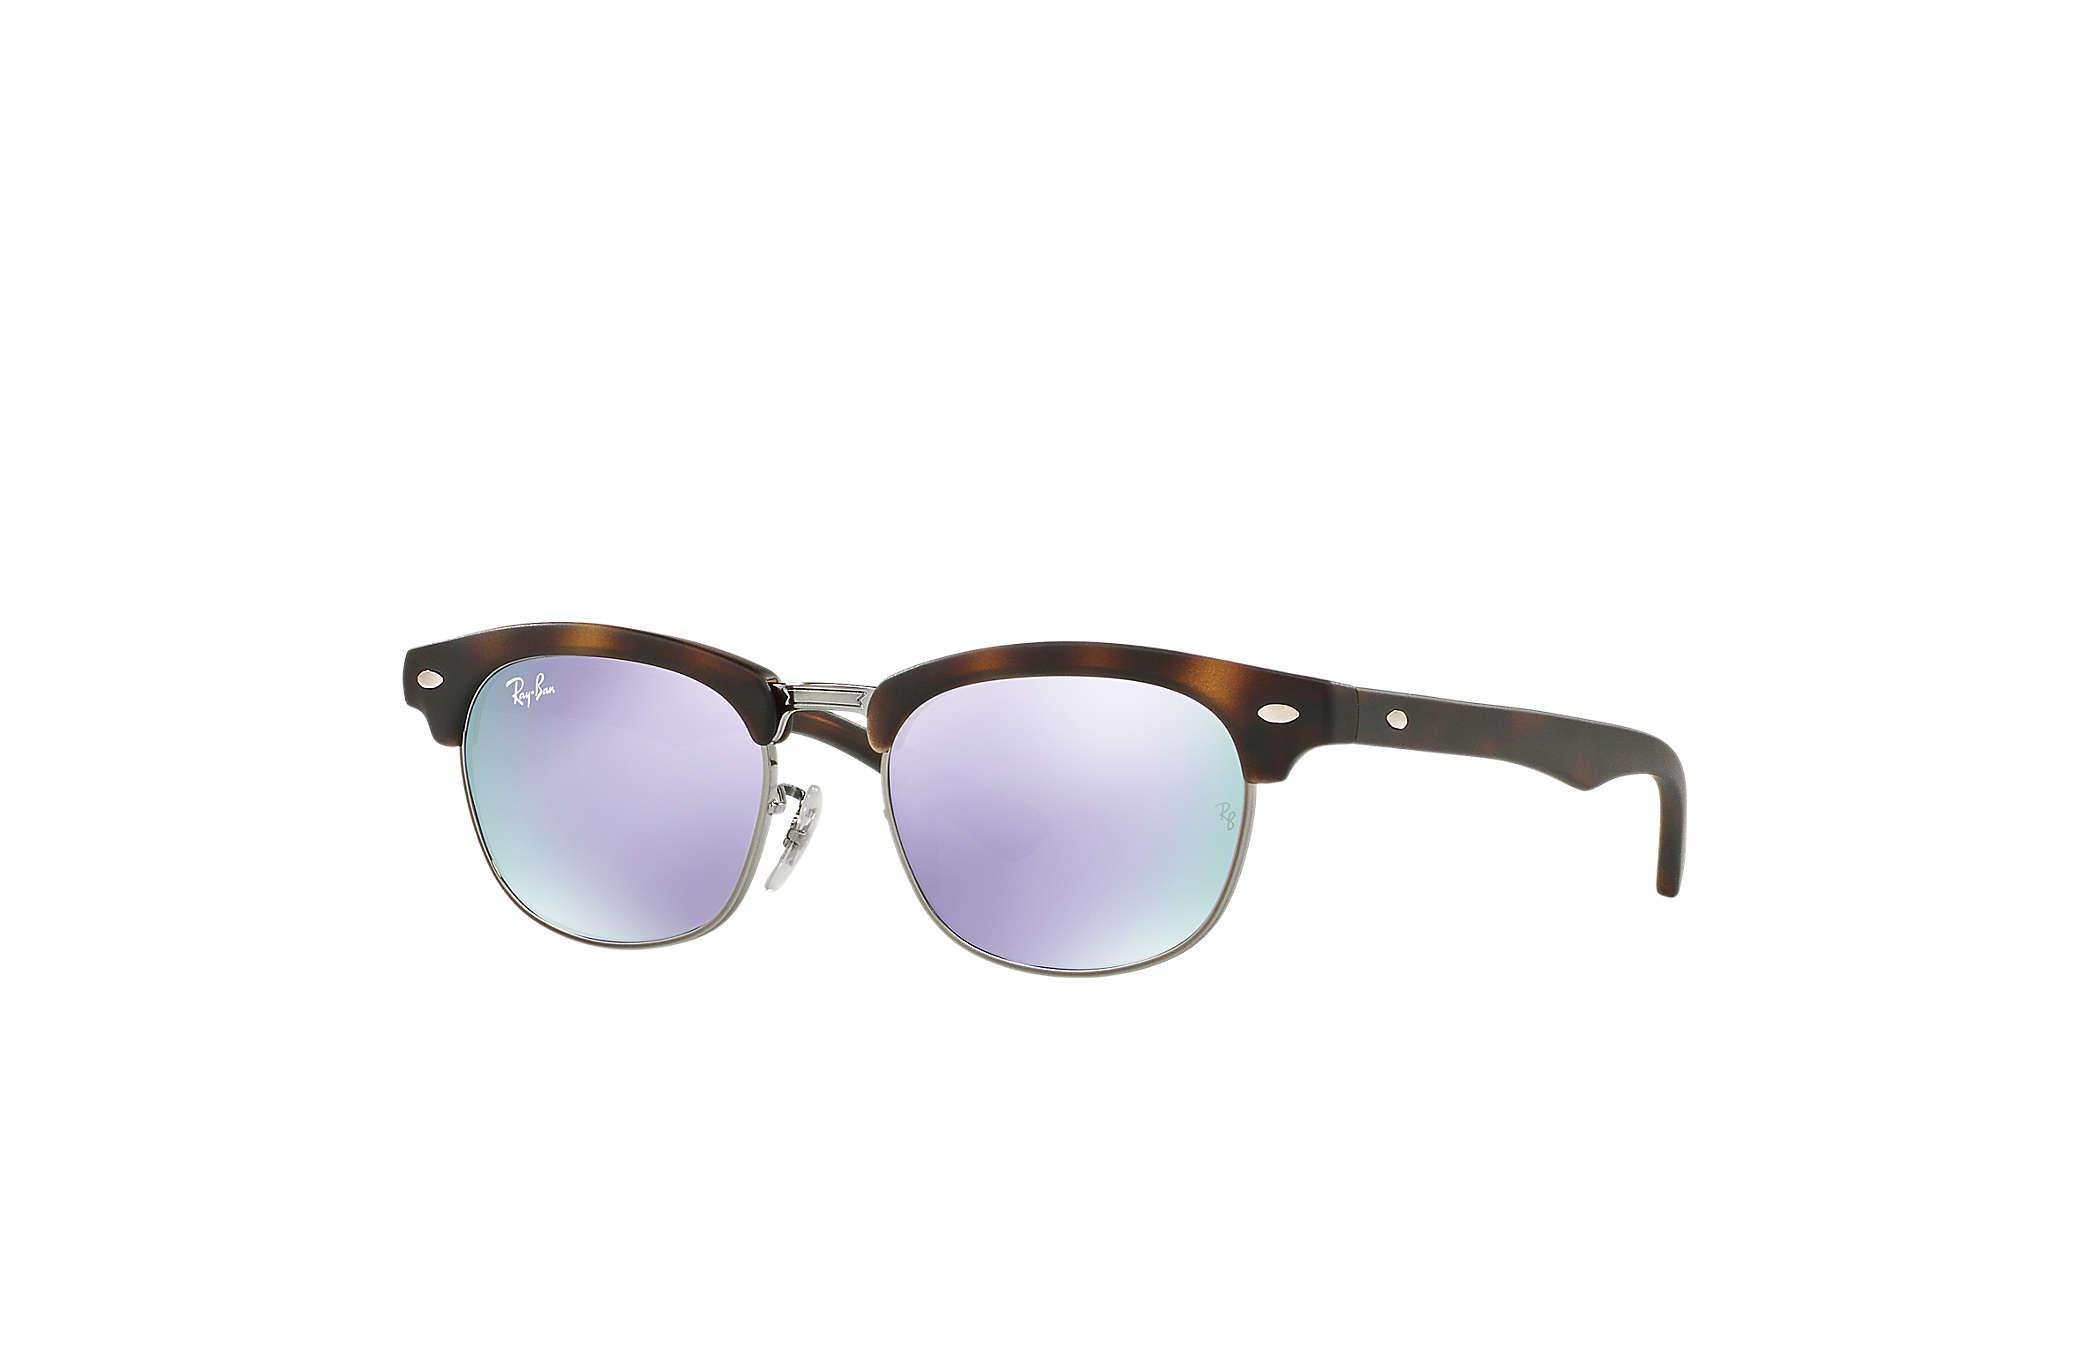 f6fa63e2581f9 Ray-Ban Clubmaster Junior RB9050S Tortoise - Nylon - Lilac Lenses ...